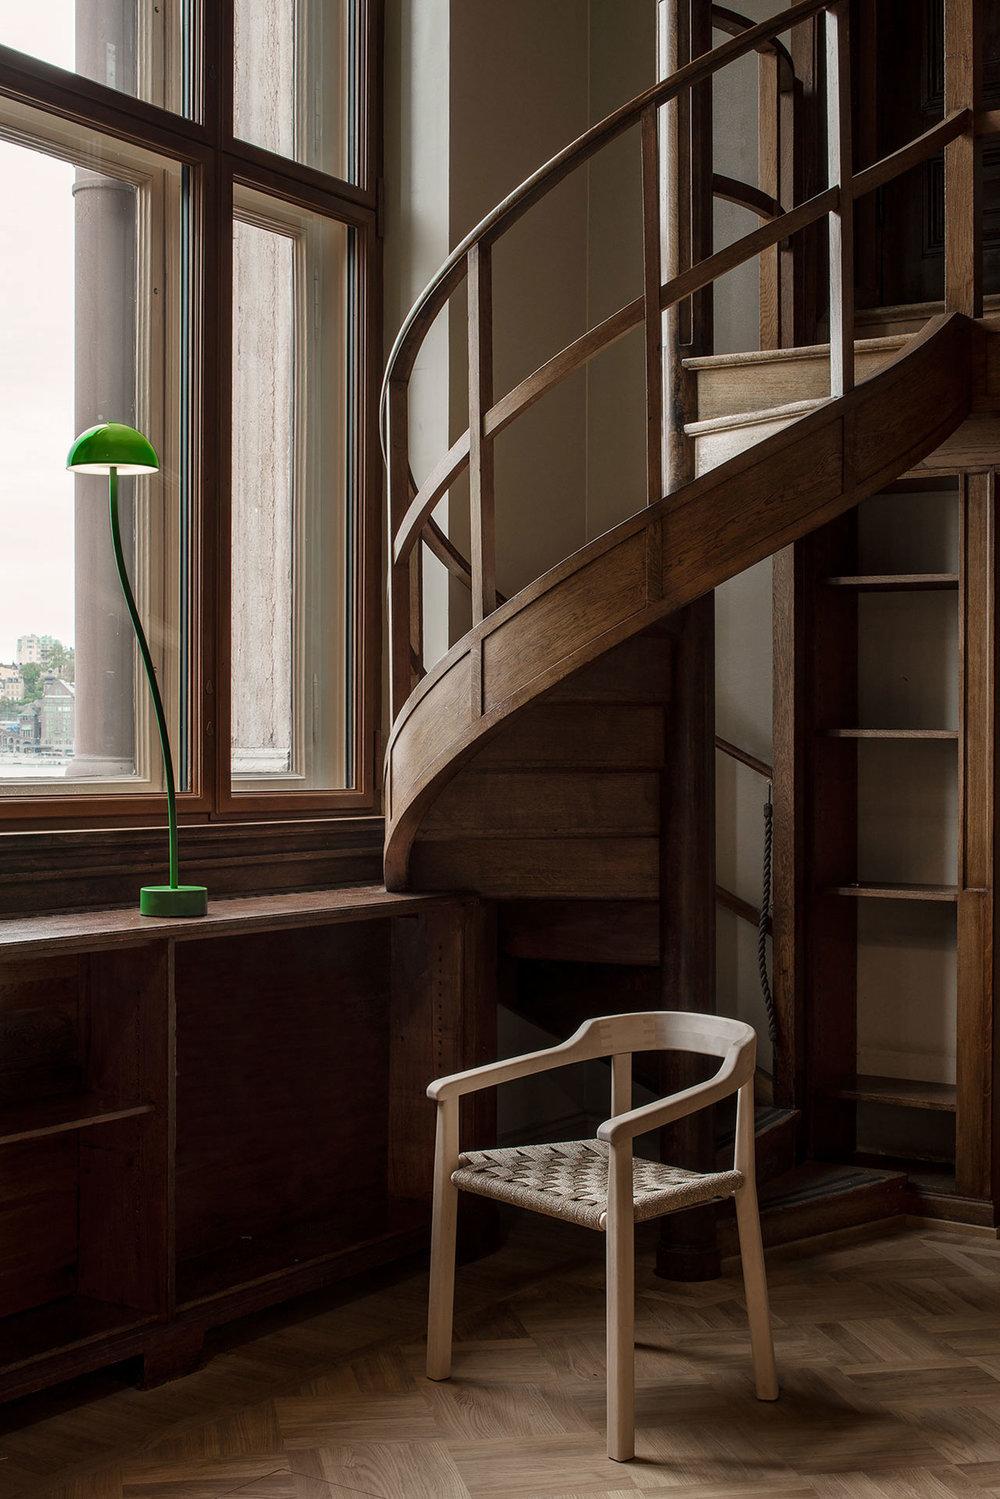 s3_nm_en_ny_samling_restaurant_nationalmuseum_stockholm_sweden_yatzer.jpg